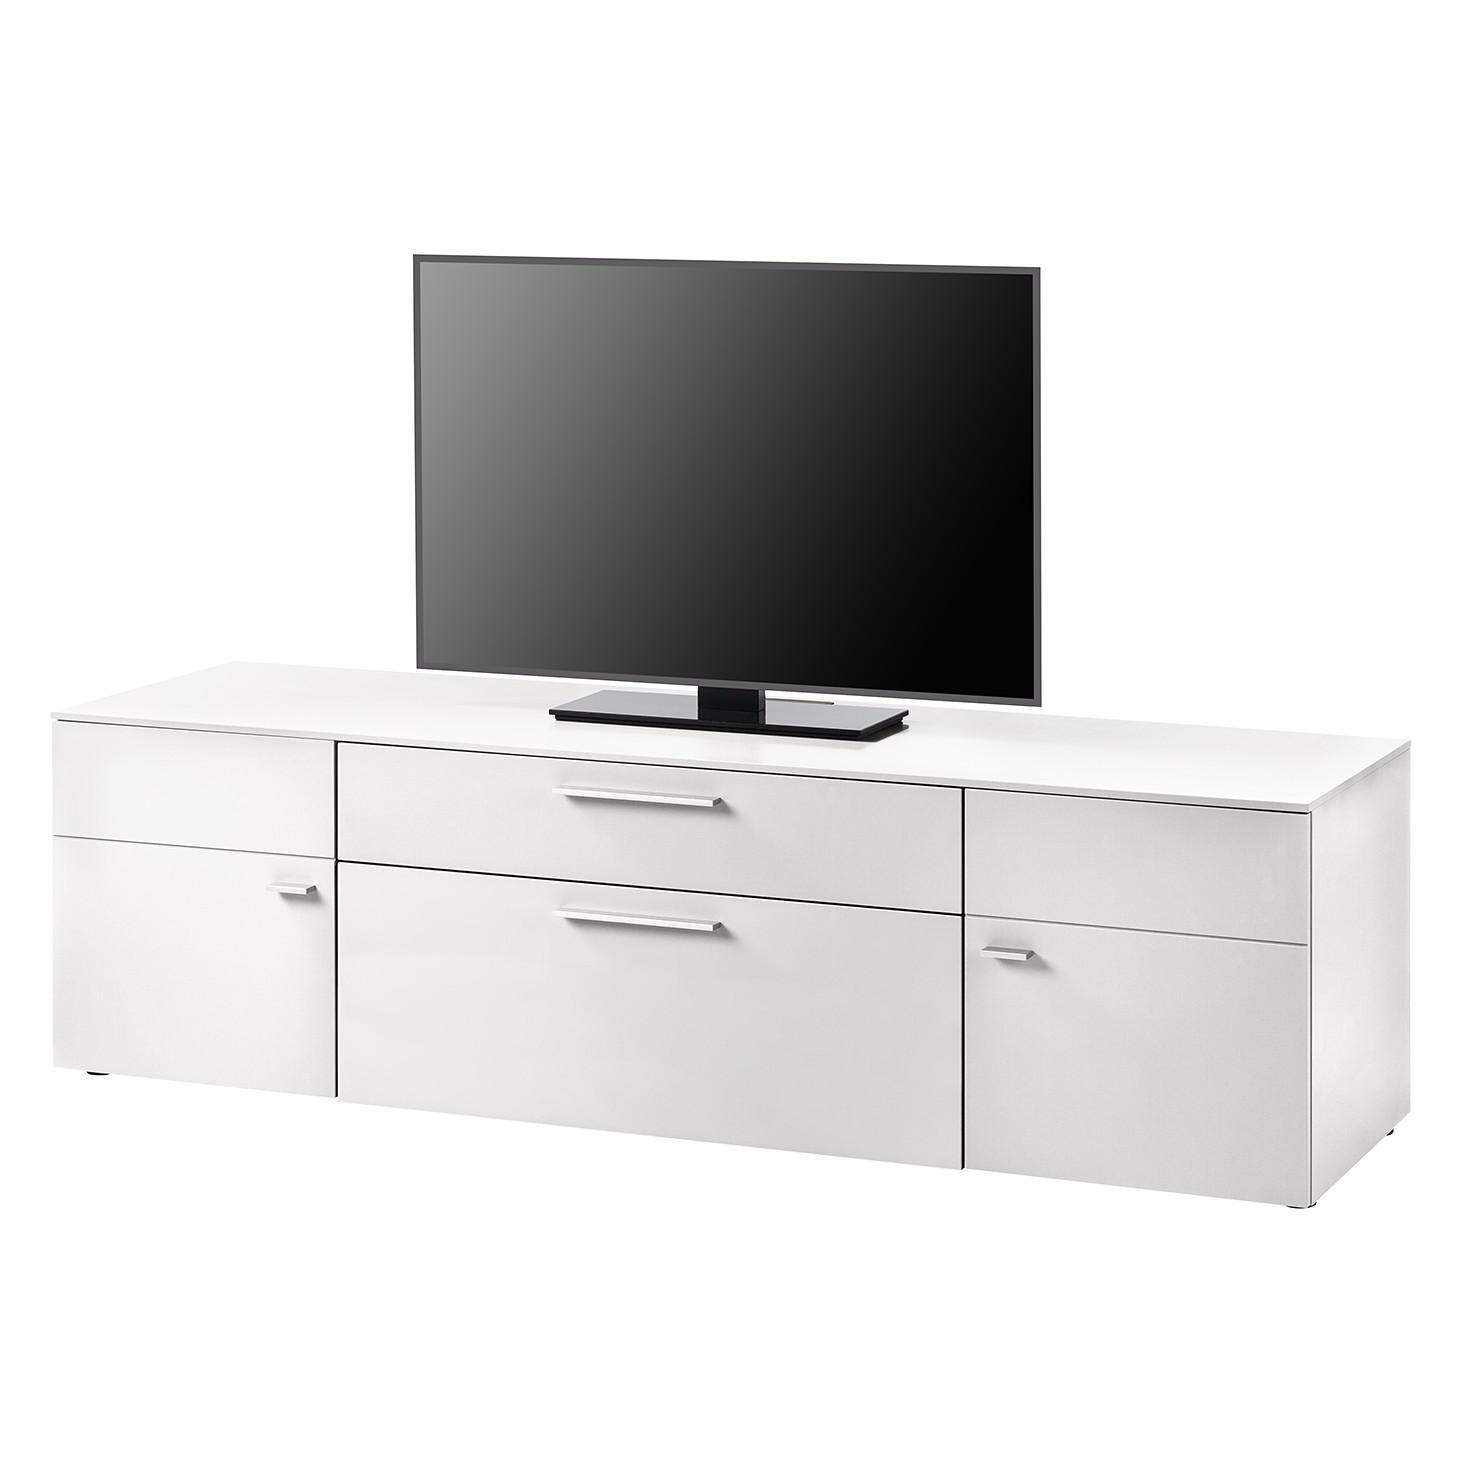 Meuble TV Anzio I - Blanc mat, Netfurn by GWINNER